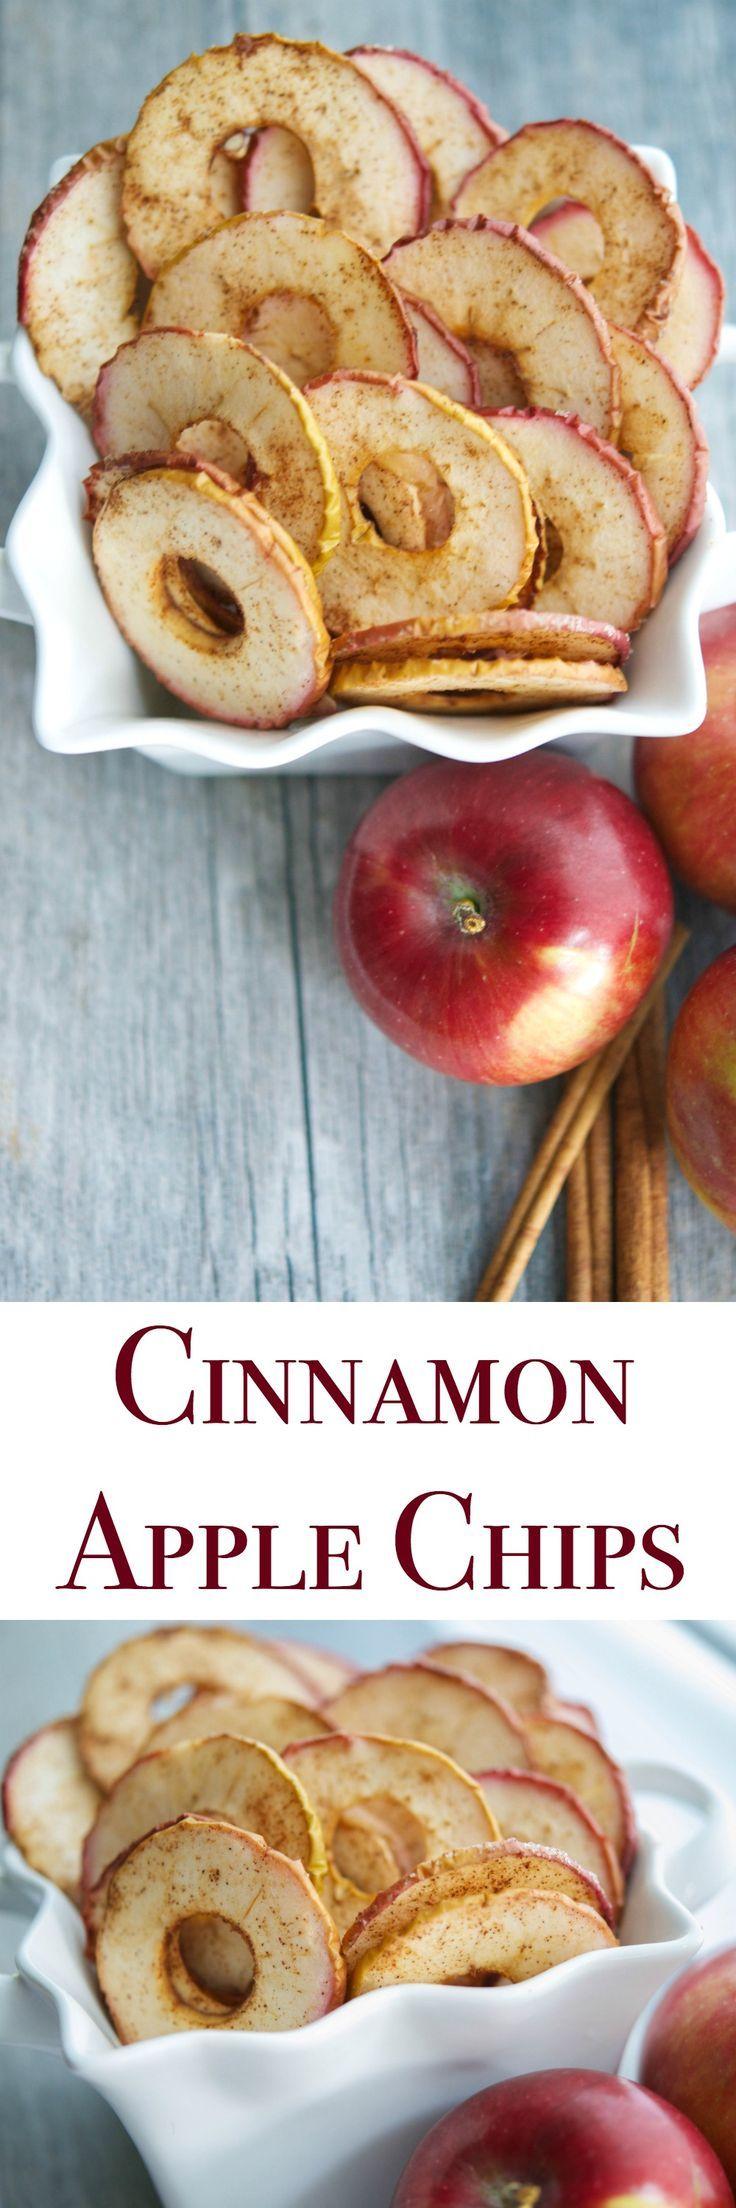 Cinnamon Apple Chips Recipe Cinnamon apple chips, Good